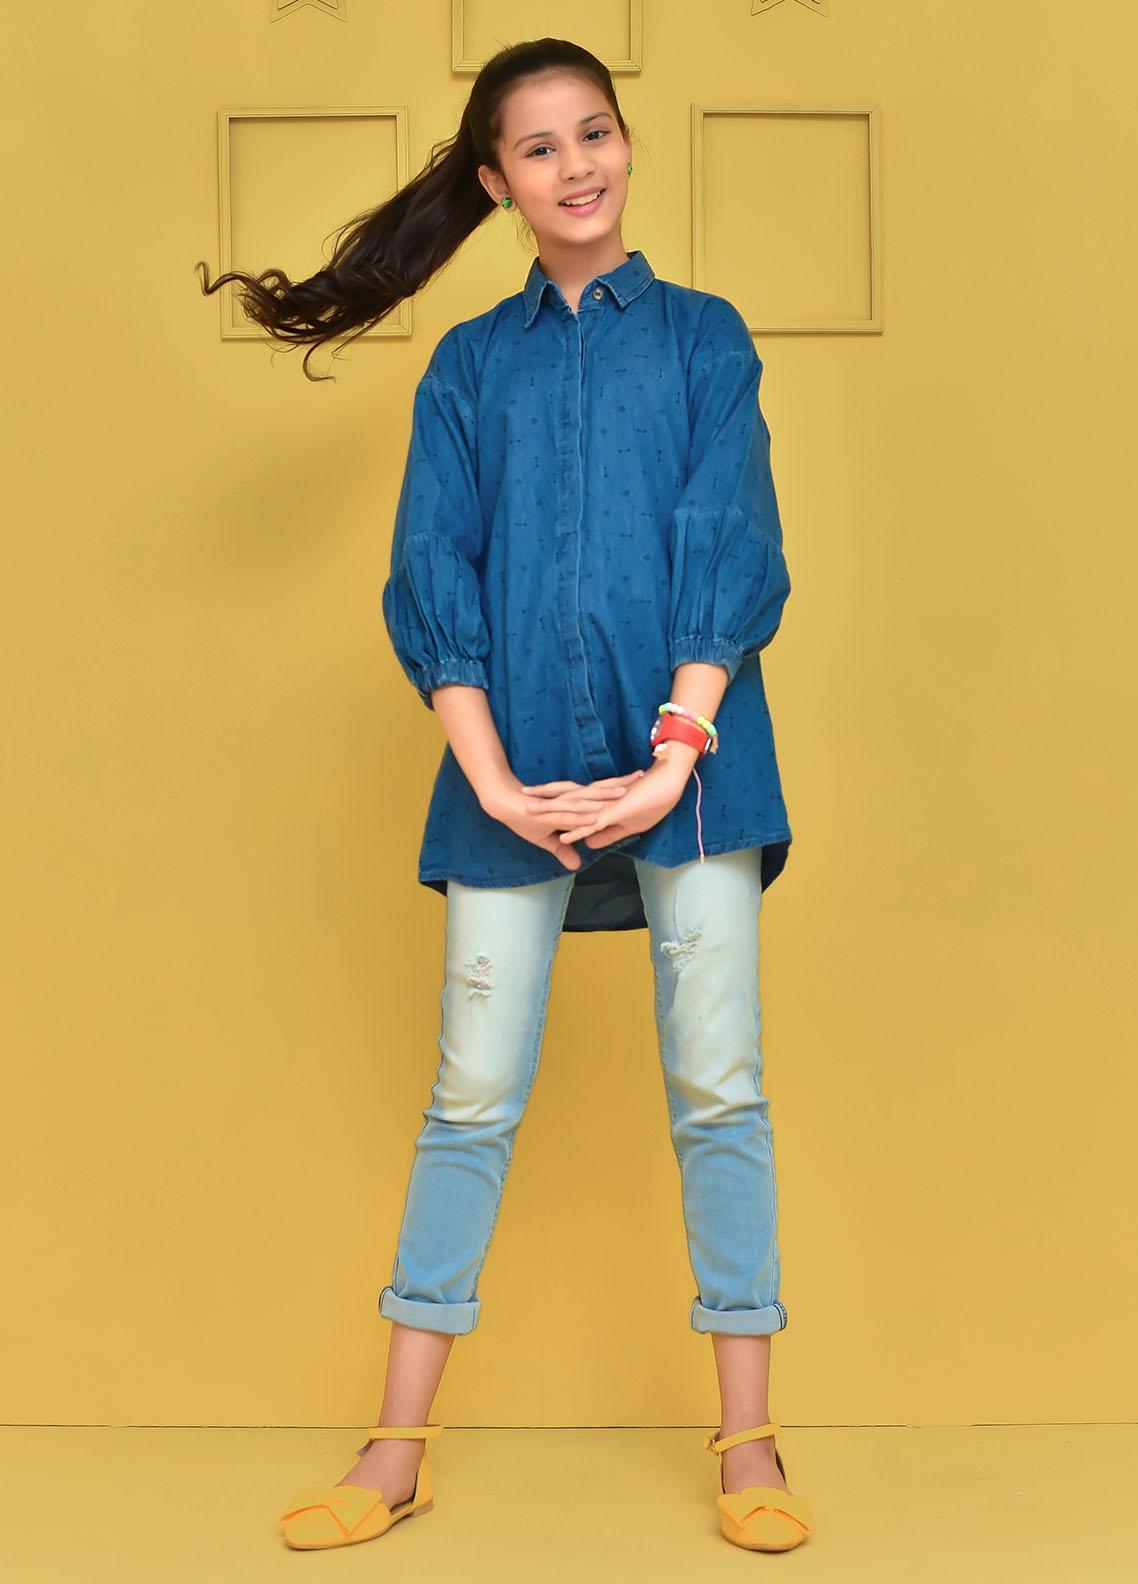 Ochre Cotton Western Top for Girls -  OWT-456 Blue